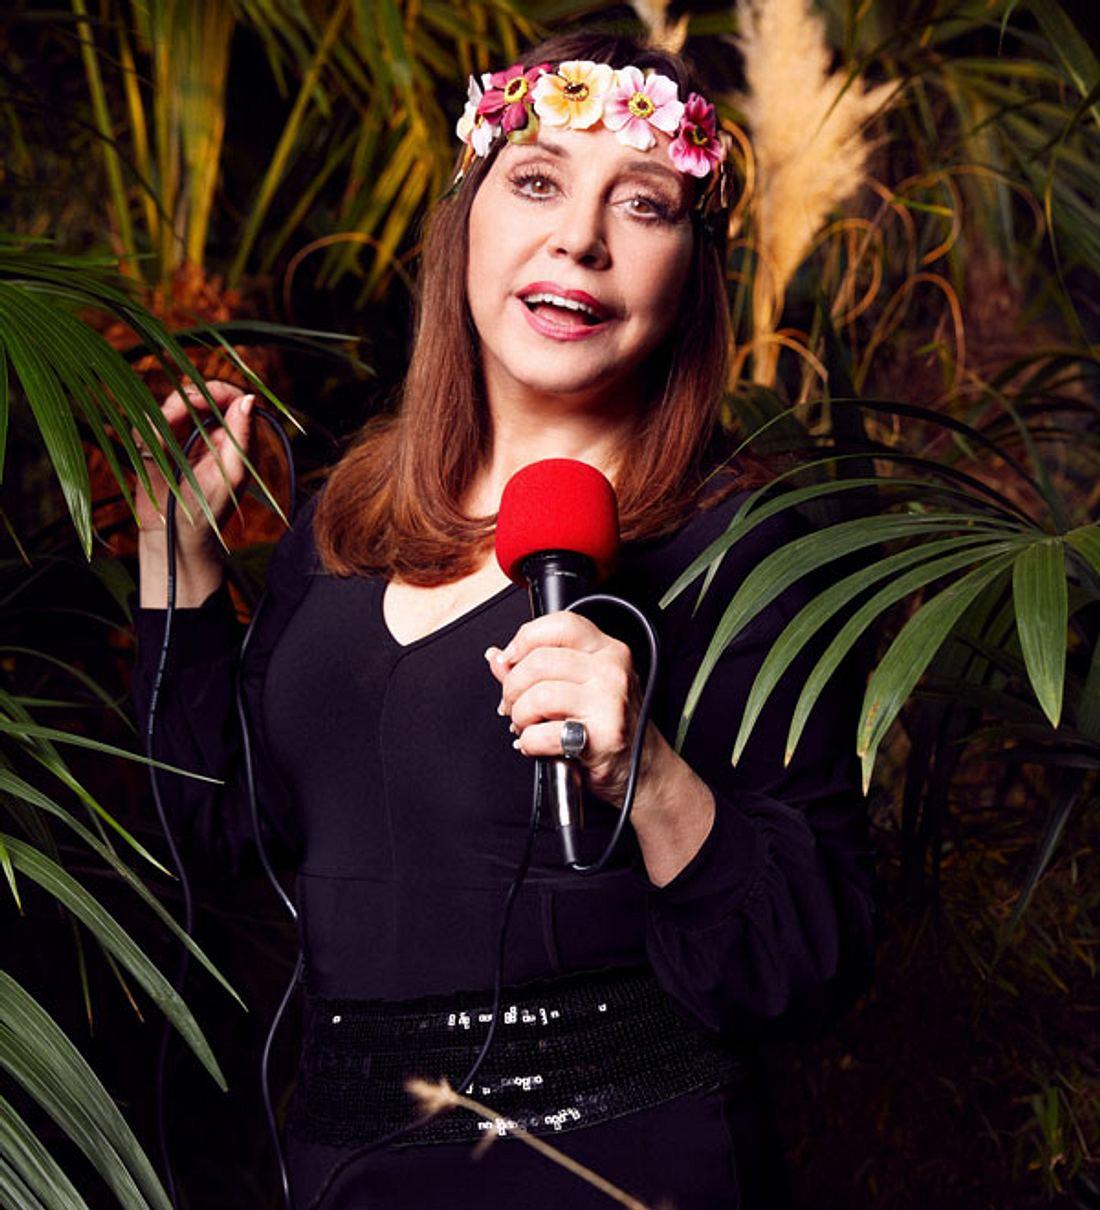 Dschungelcamp 2018: Tina York